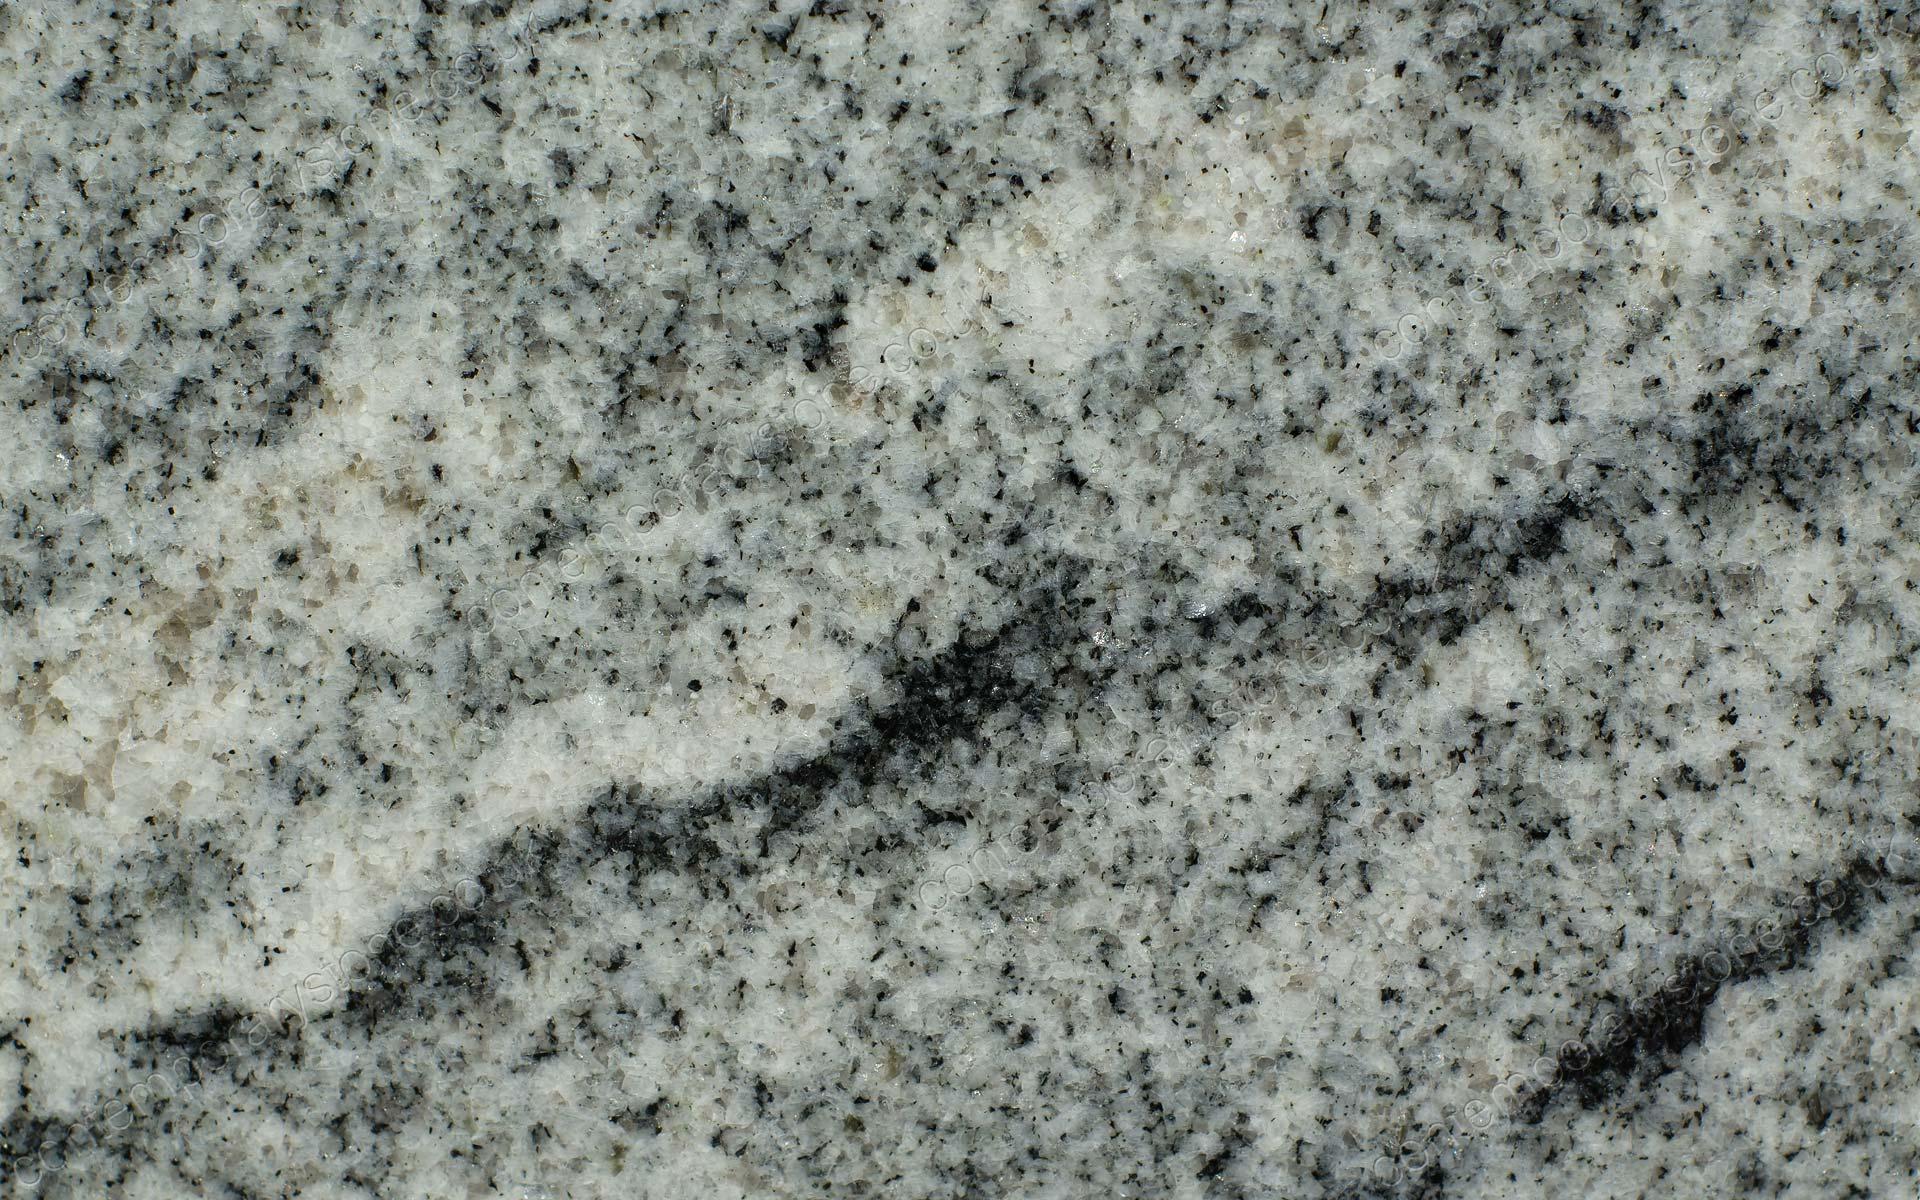 Viscount white granite close-up